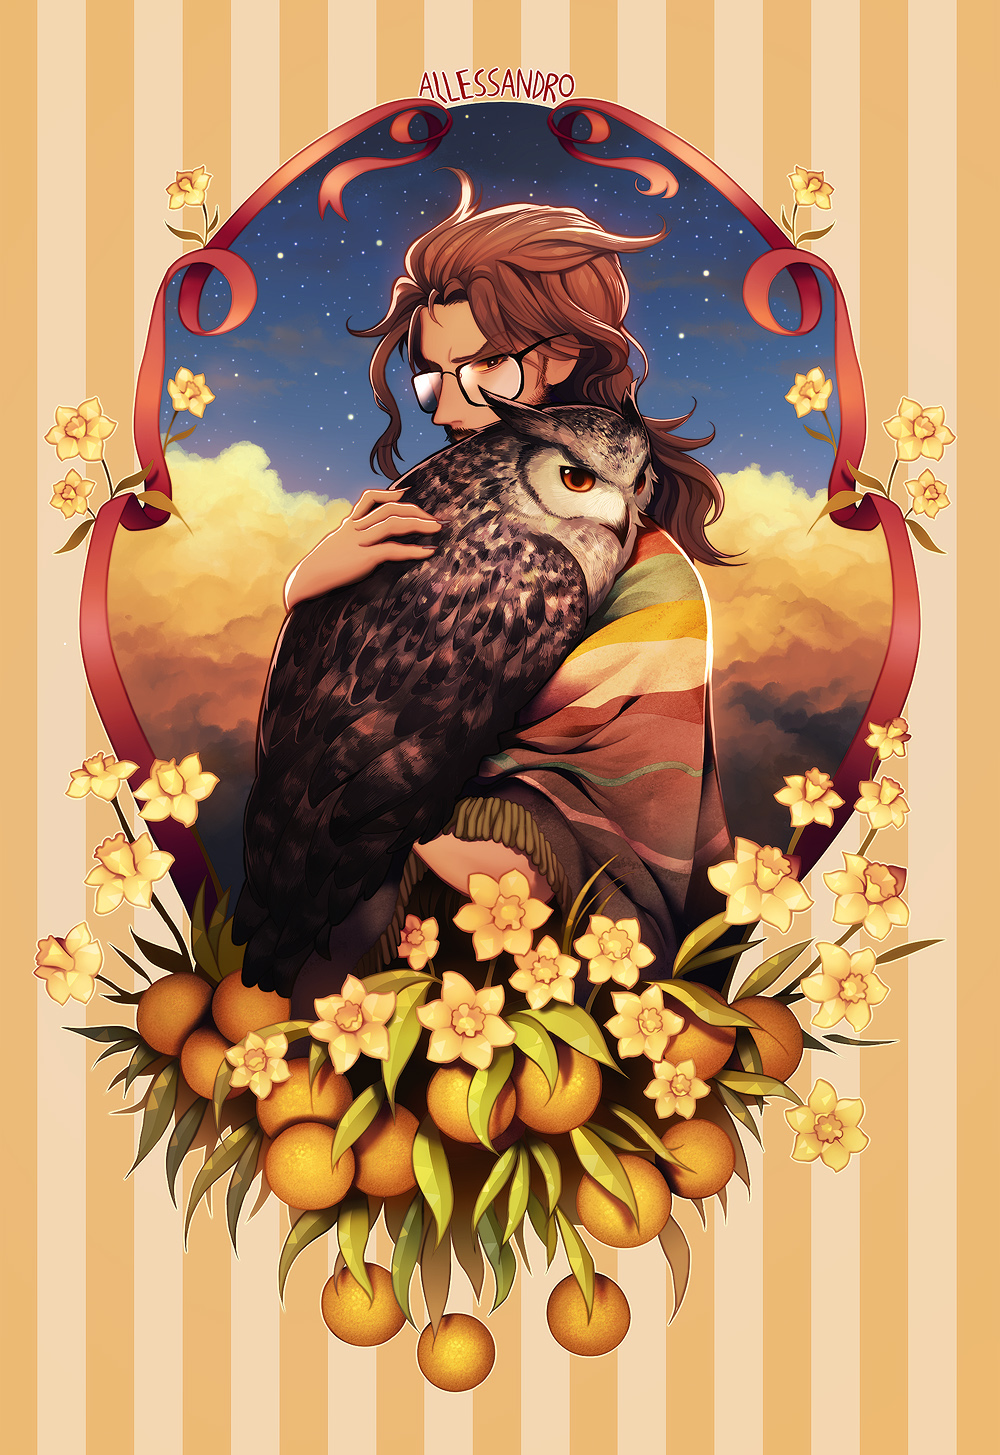 Allessandro, owl of dawn.